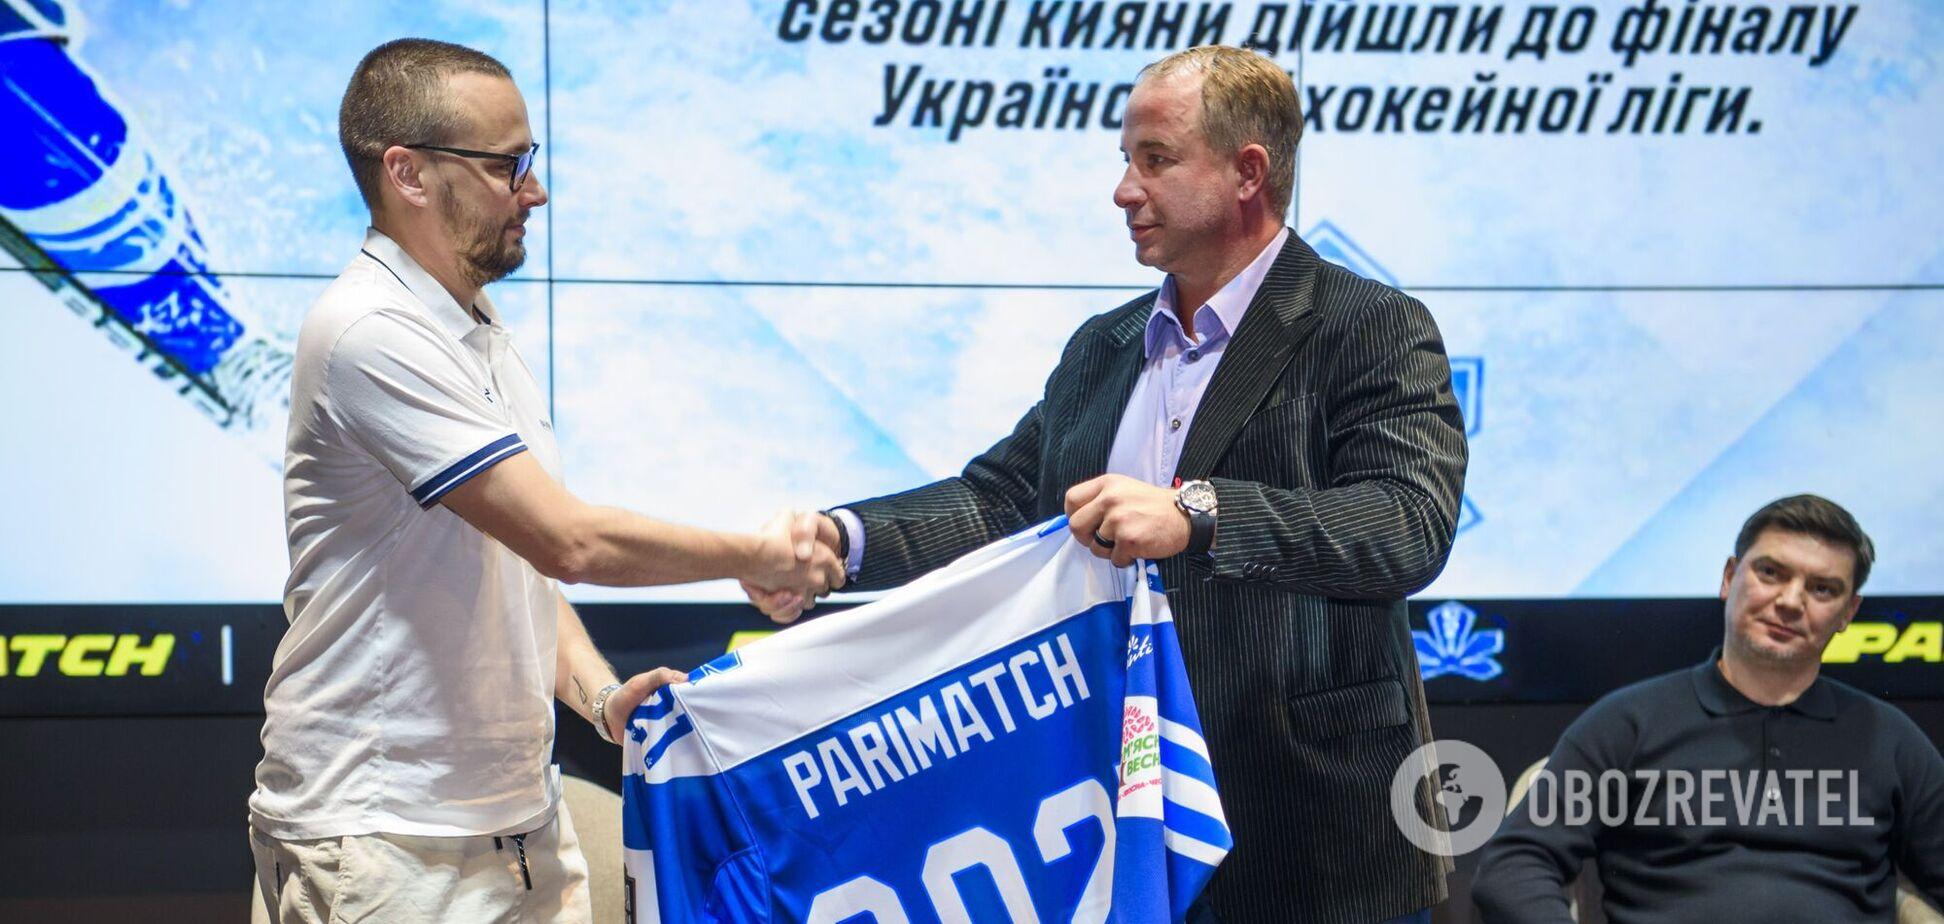 ХК 'Сокіл' розпочав співпрацю з Parimatch Ukraine